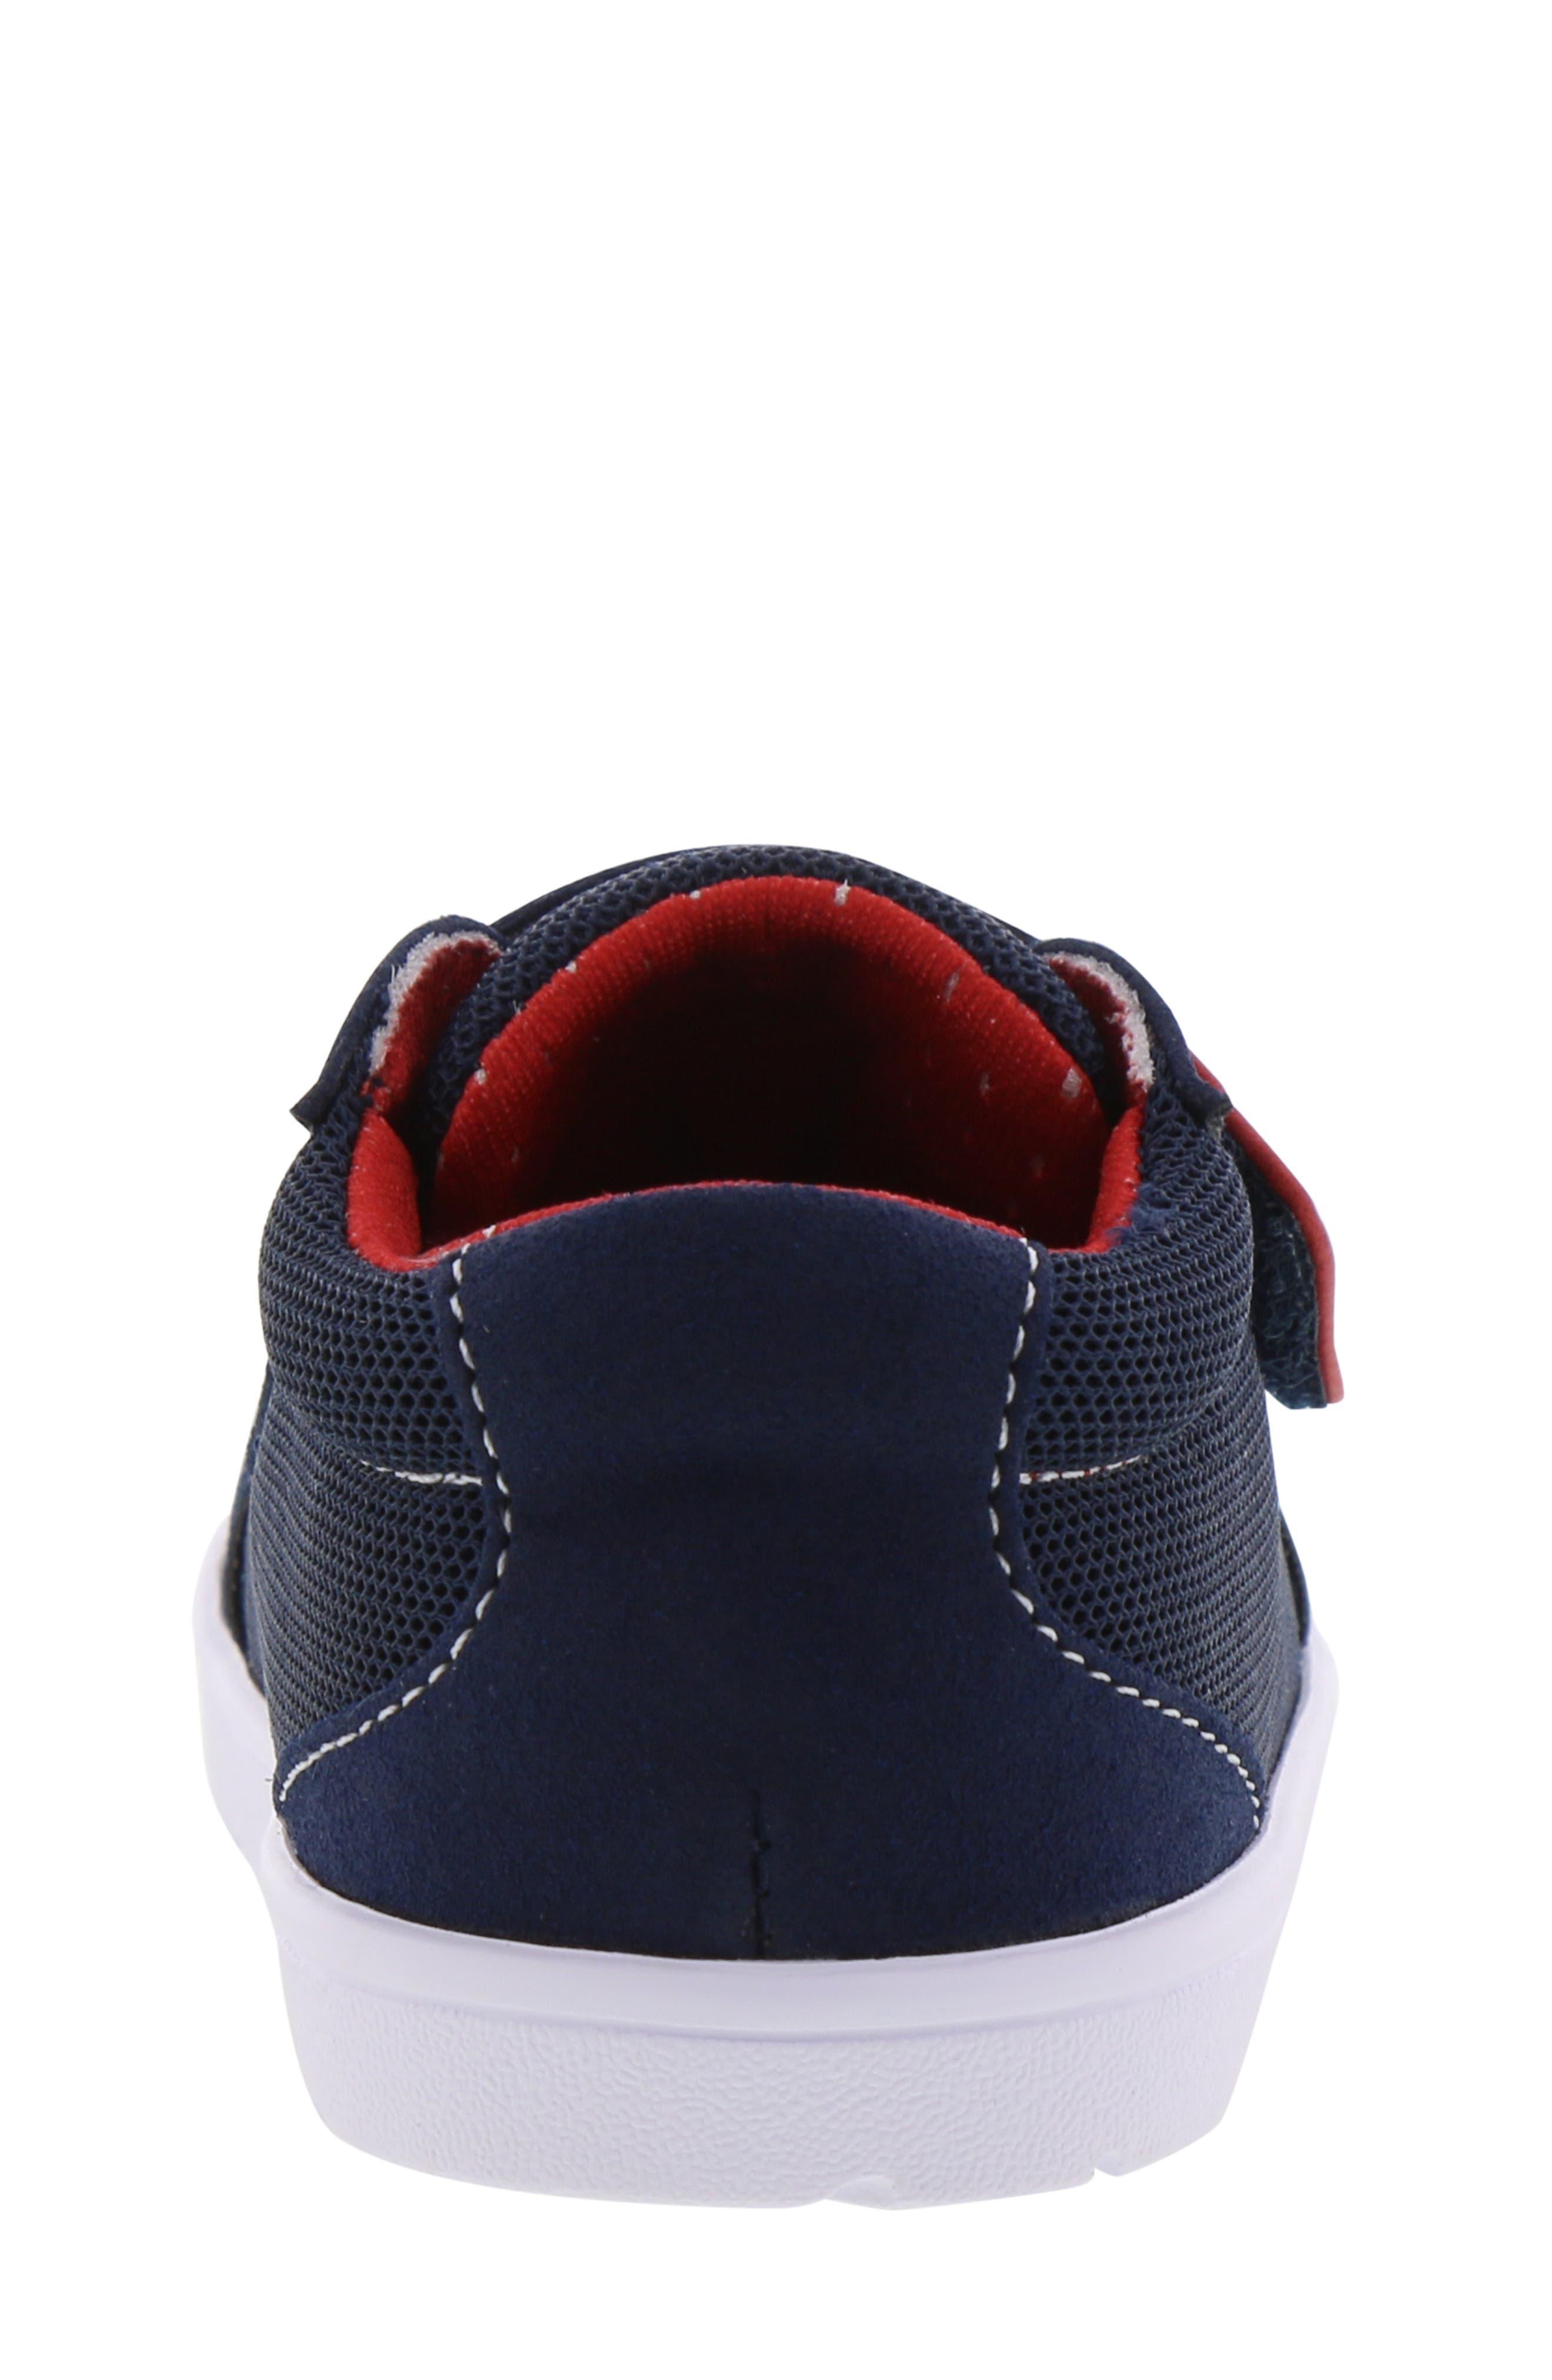 BØRN,                             Bailey Clark Sneaker,                             Alternate thumbnail 7, color,                             NAVY